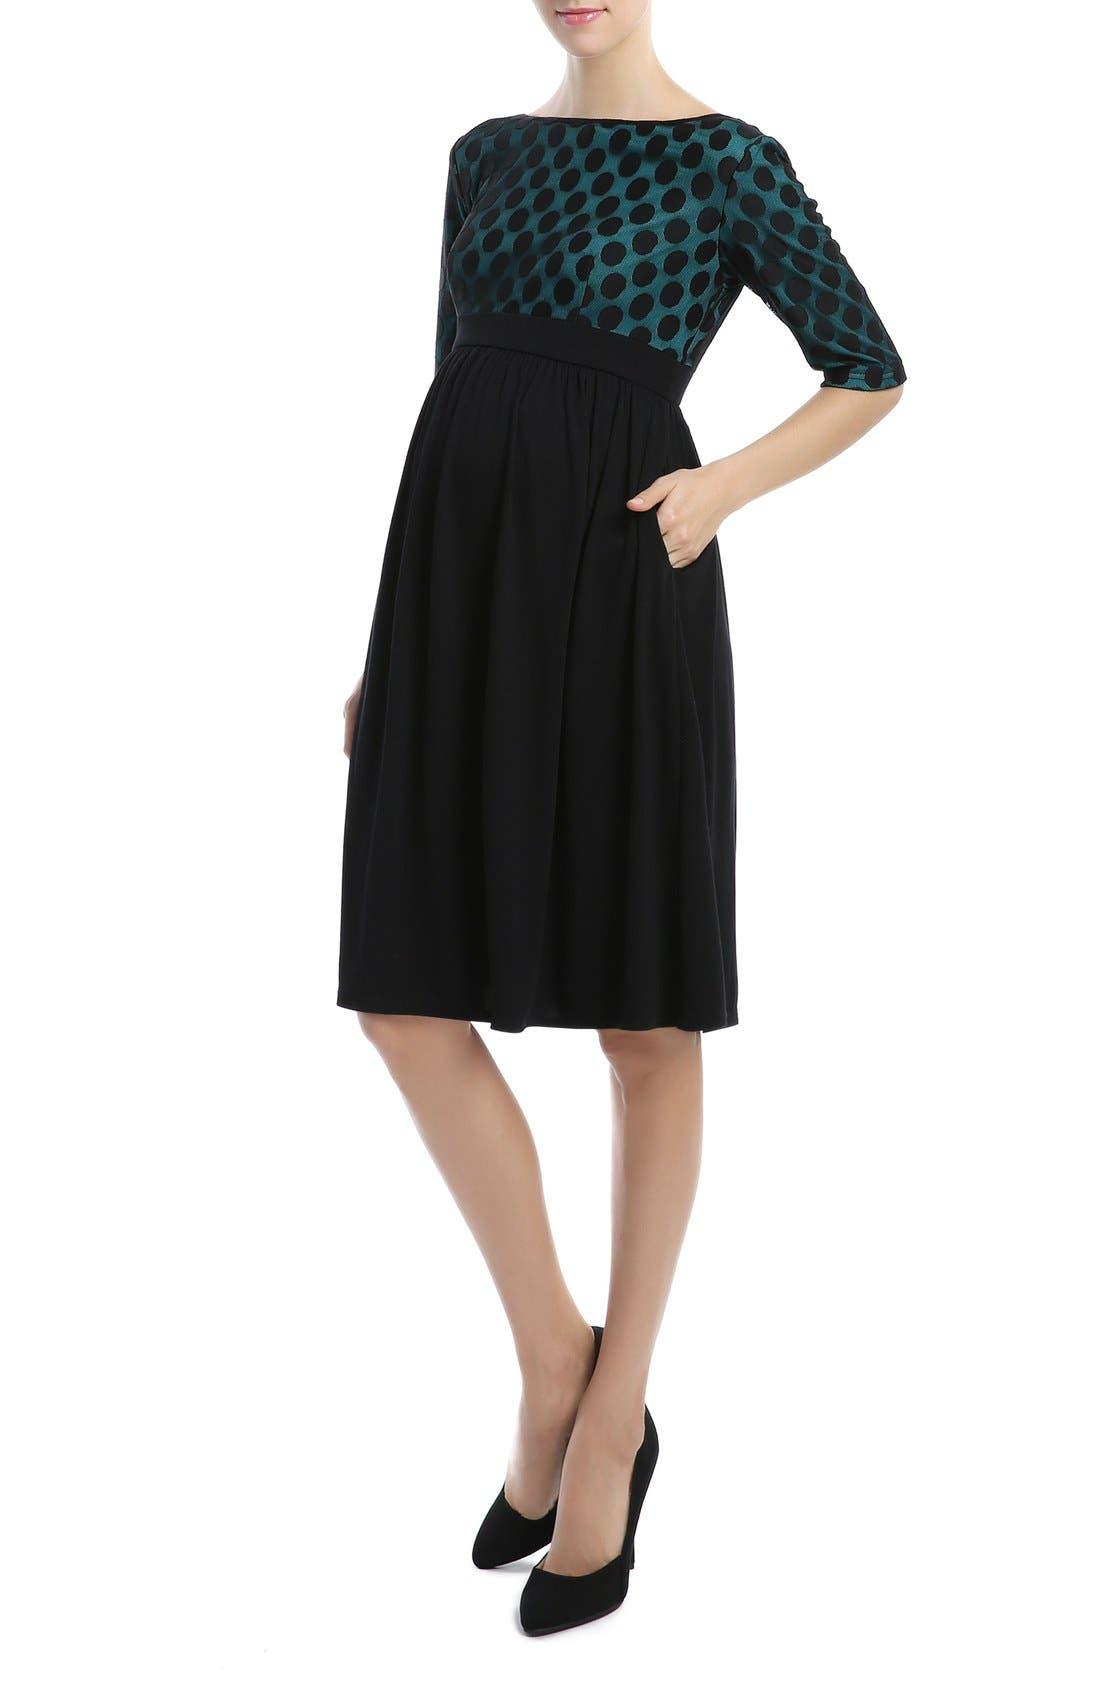 'Charlie' Maternity Dress,                             Alternate thumbnail 4, color,                             Black/ Teal